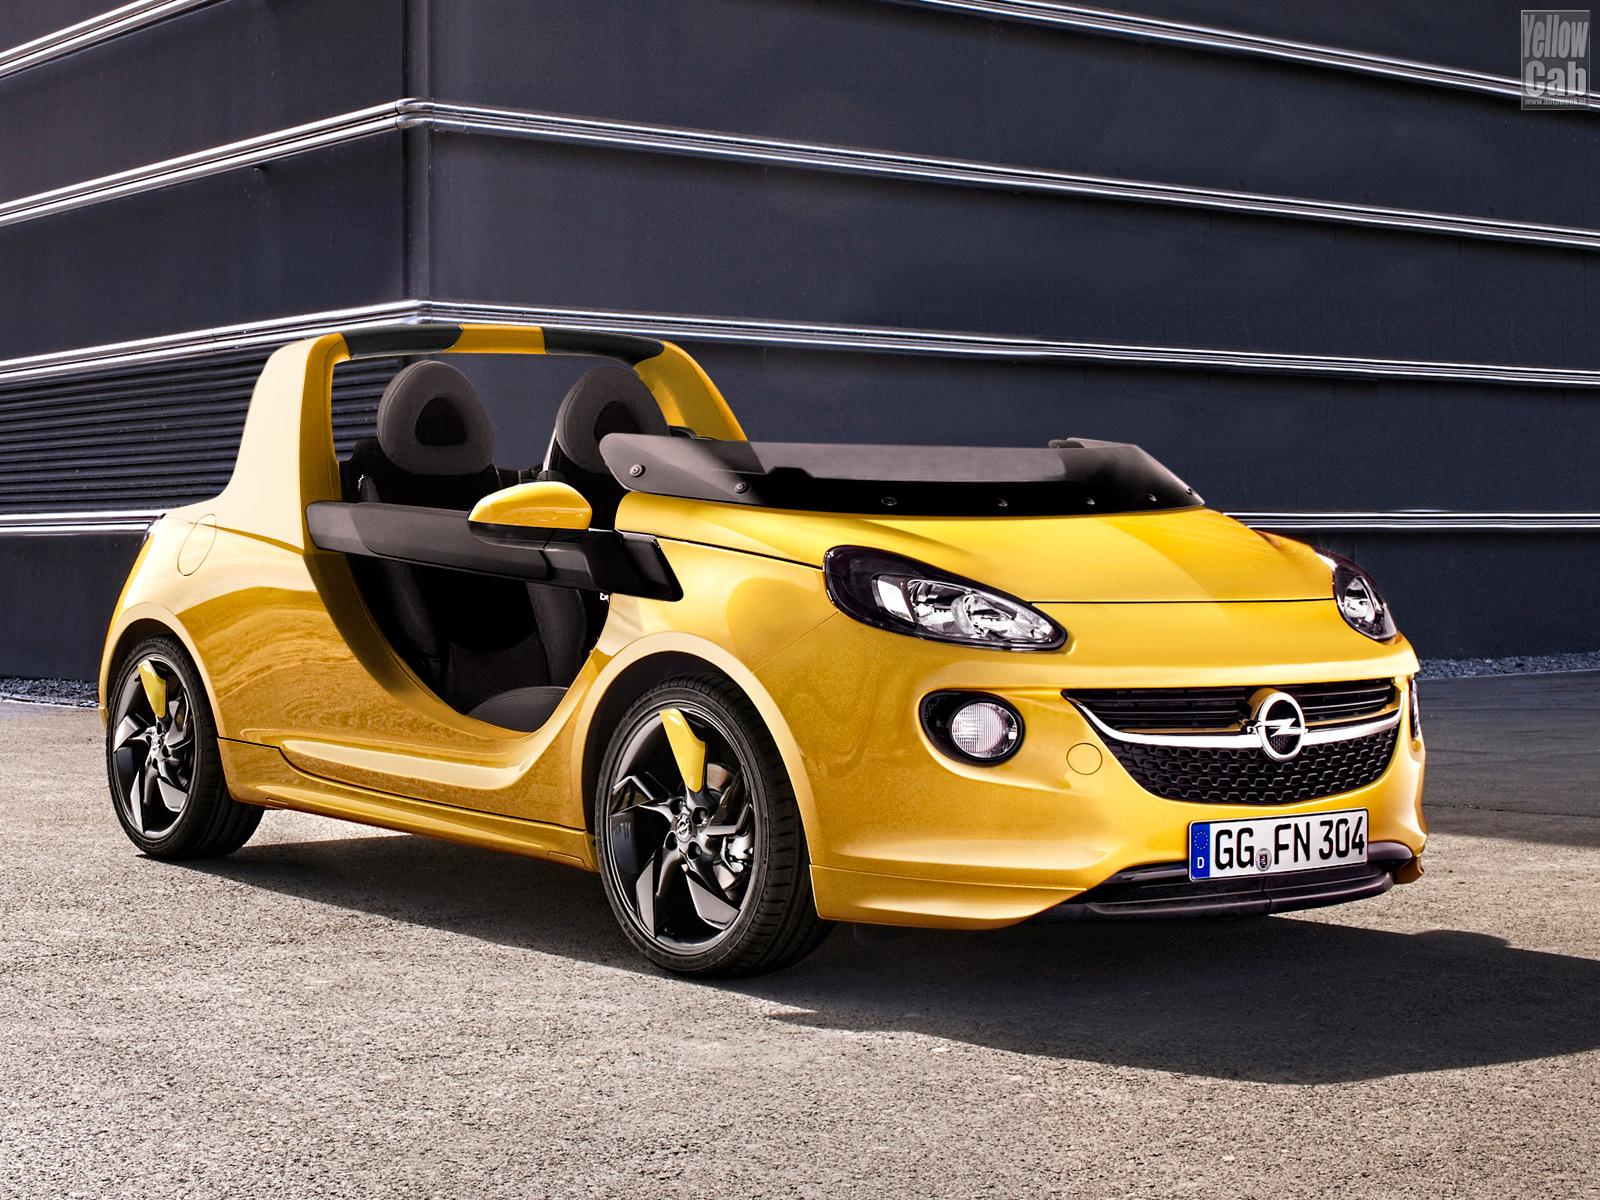 yellow cab 39 s profile automotive design studio. Black Bedroom Furniture Sets. Home Design Ideas